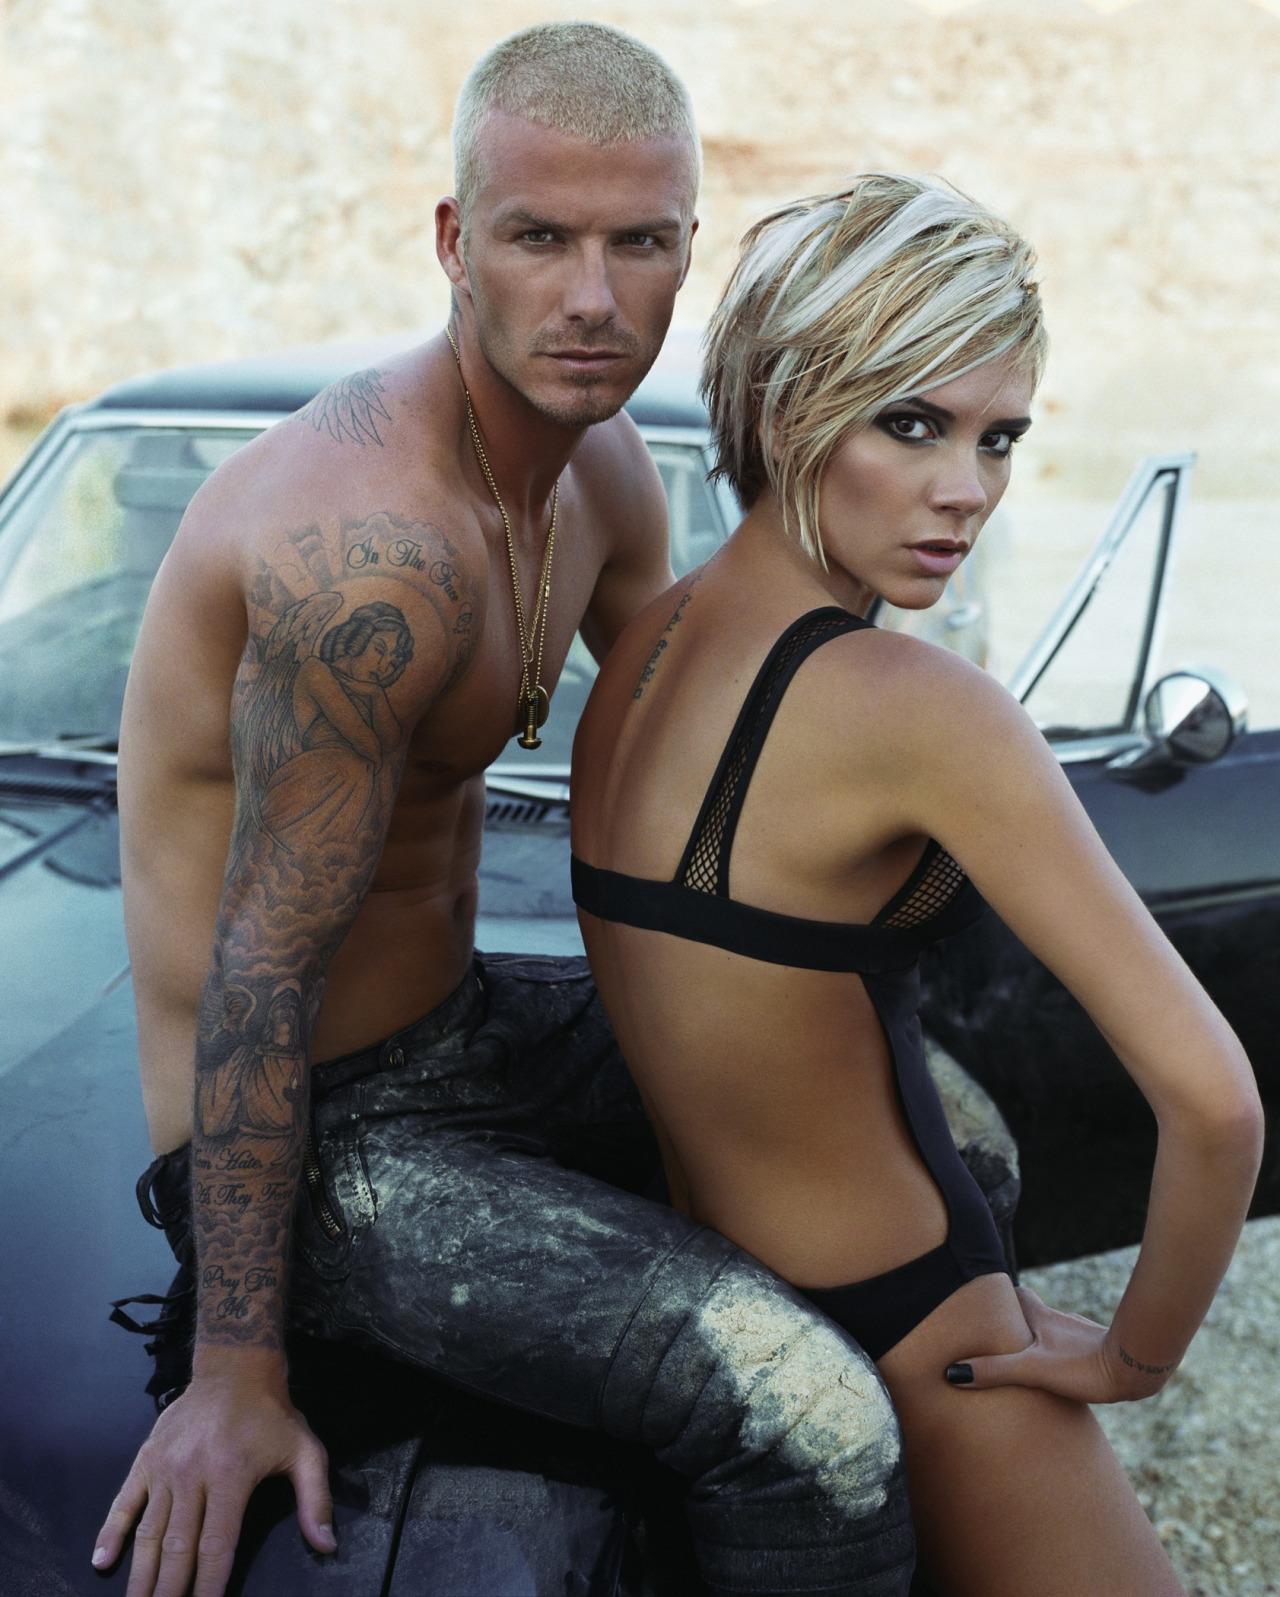 Дэвид и Виктория Бекхэм, 2007. Фото: W-Magazine